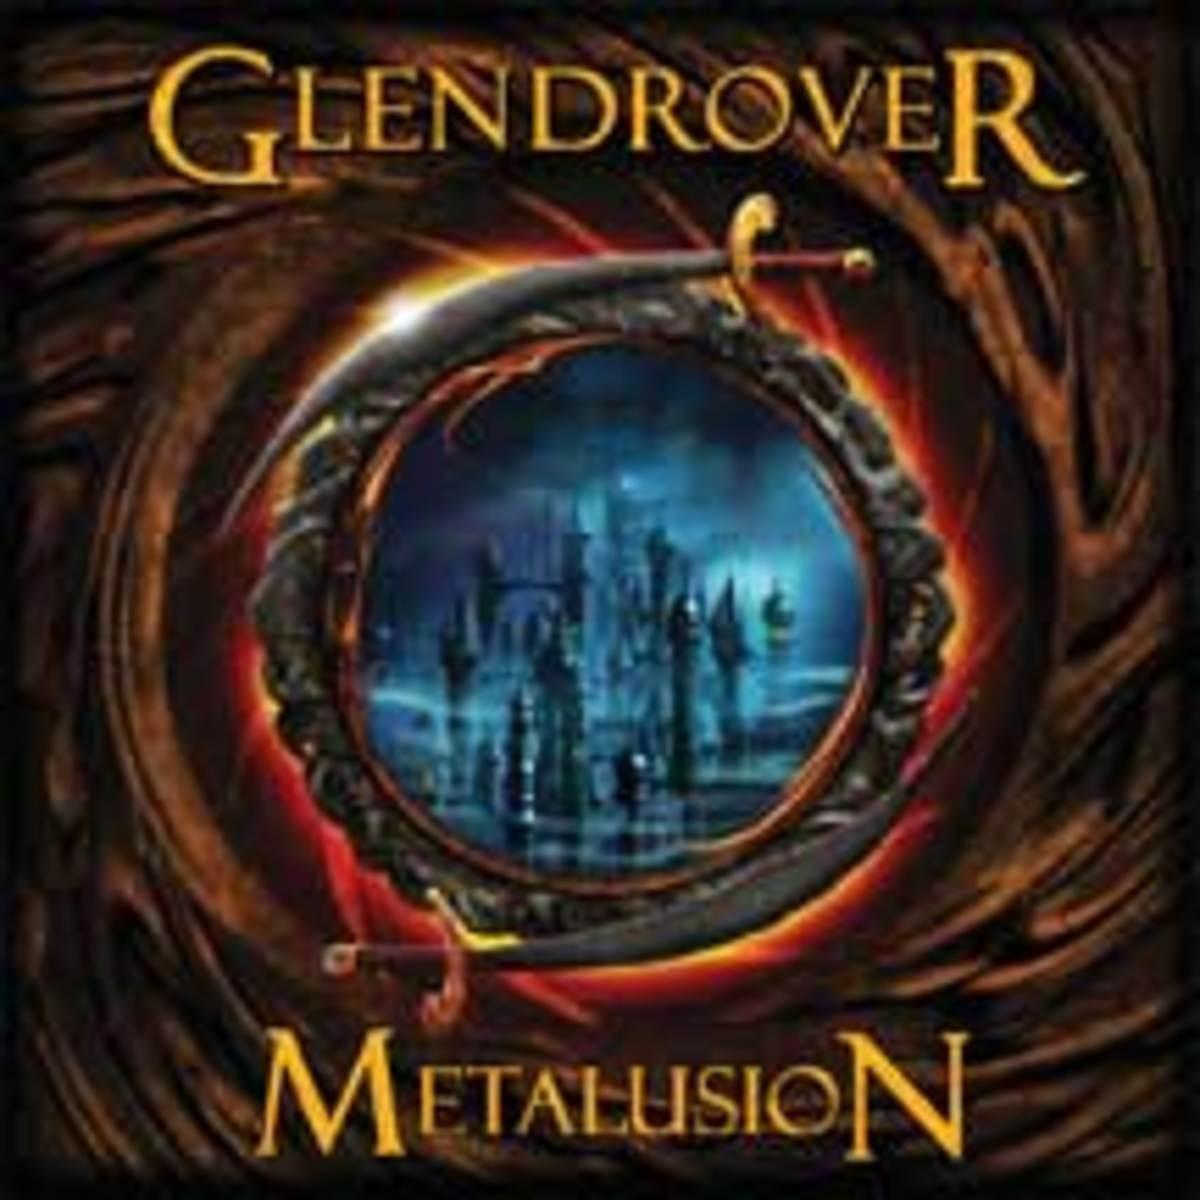 GlenDrover_Metalusion